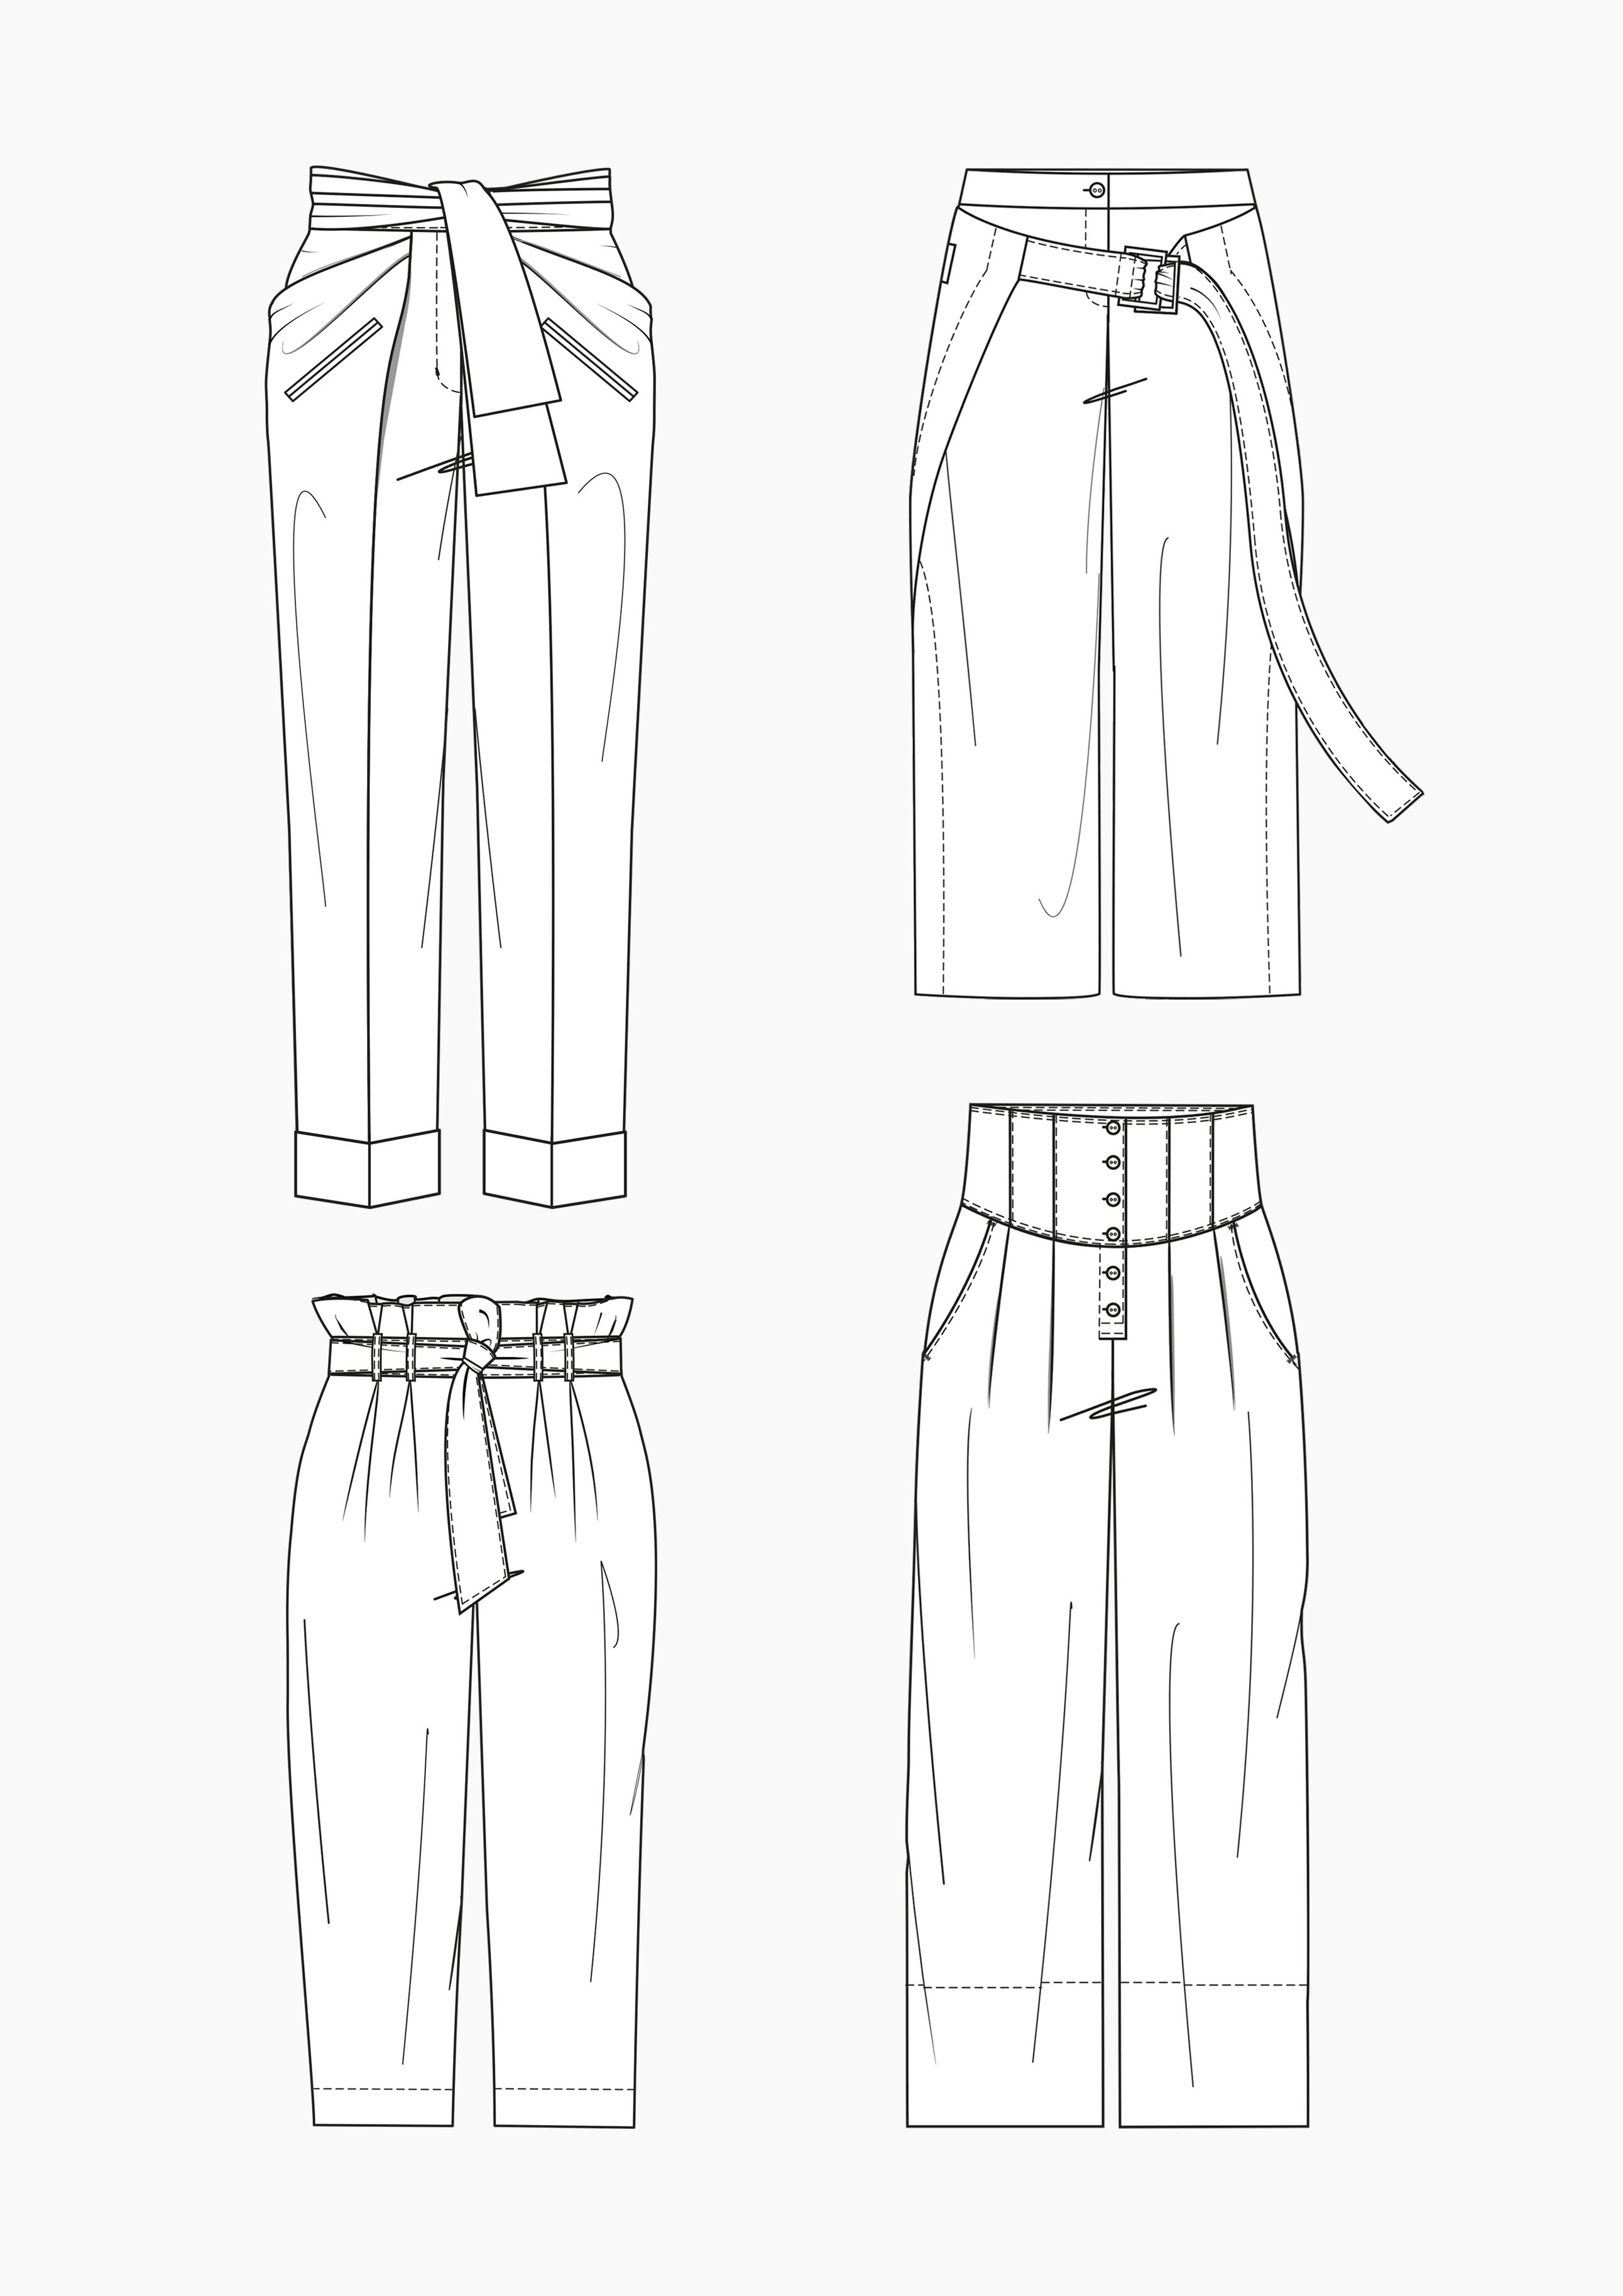 Produkt: Schnitt-Technik Weite Hosen